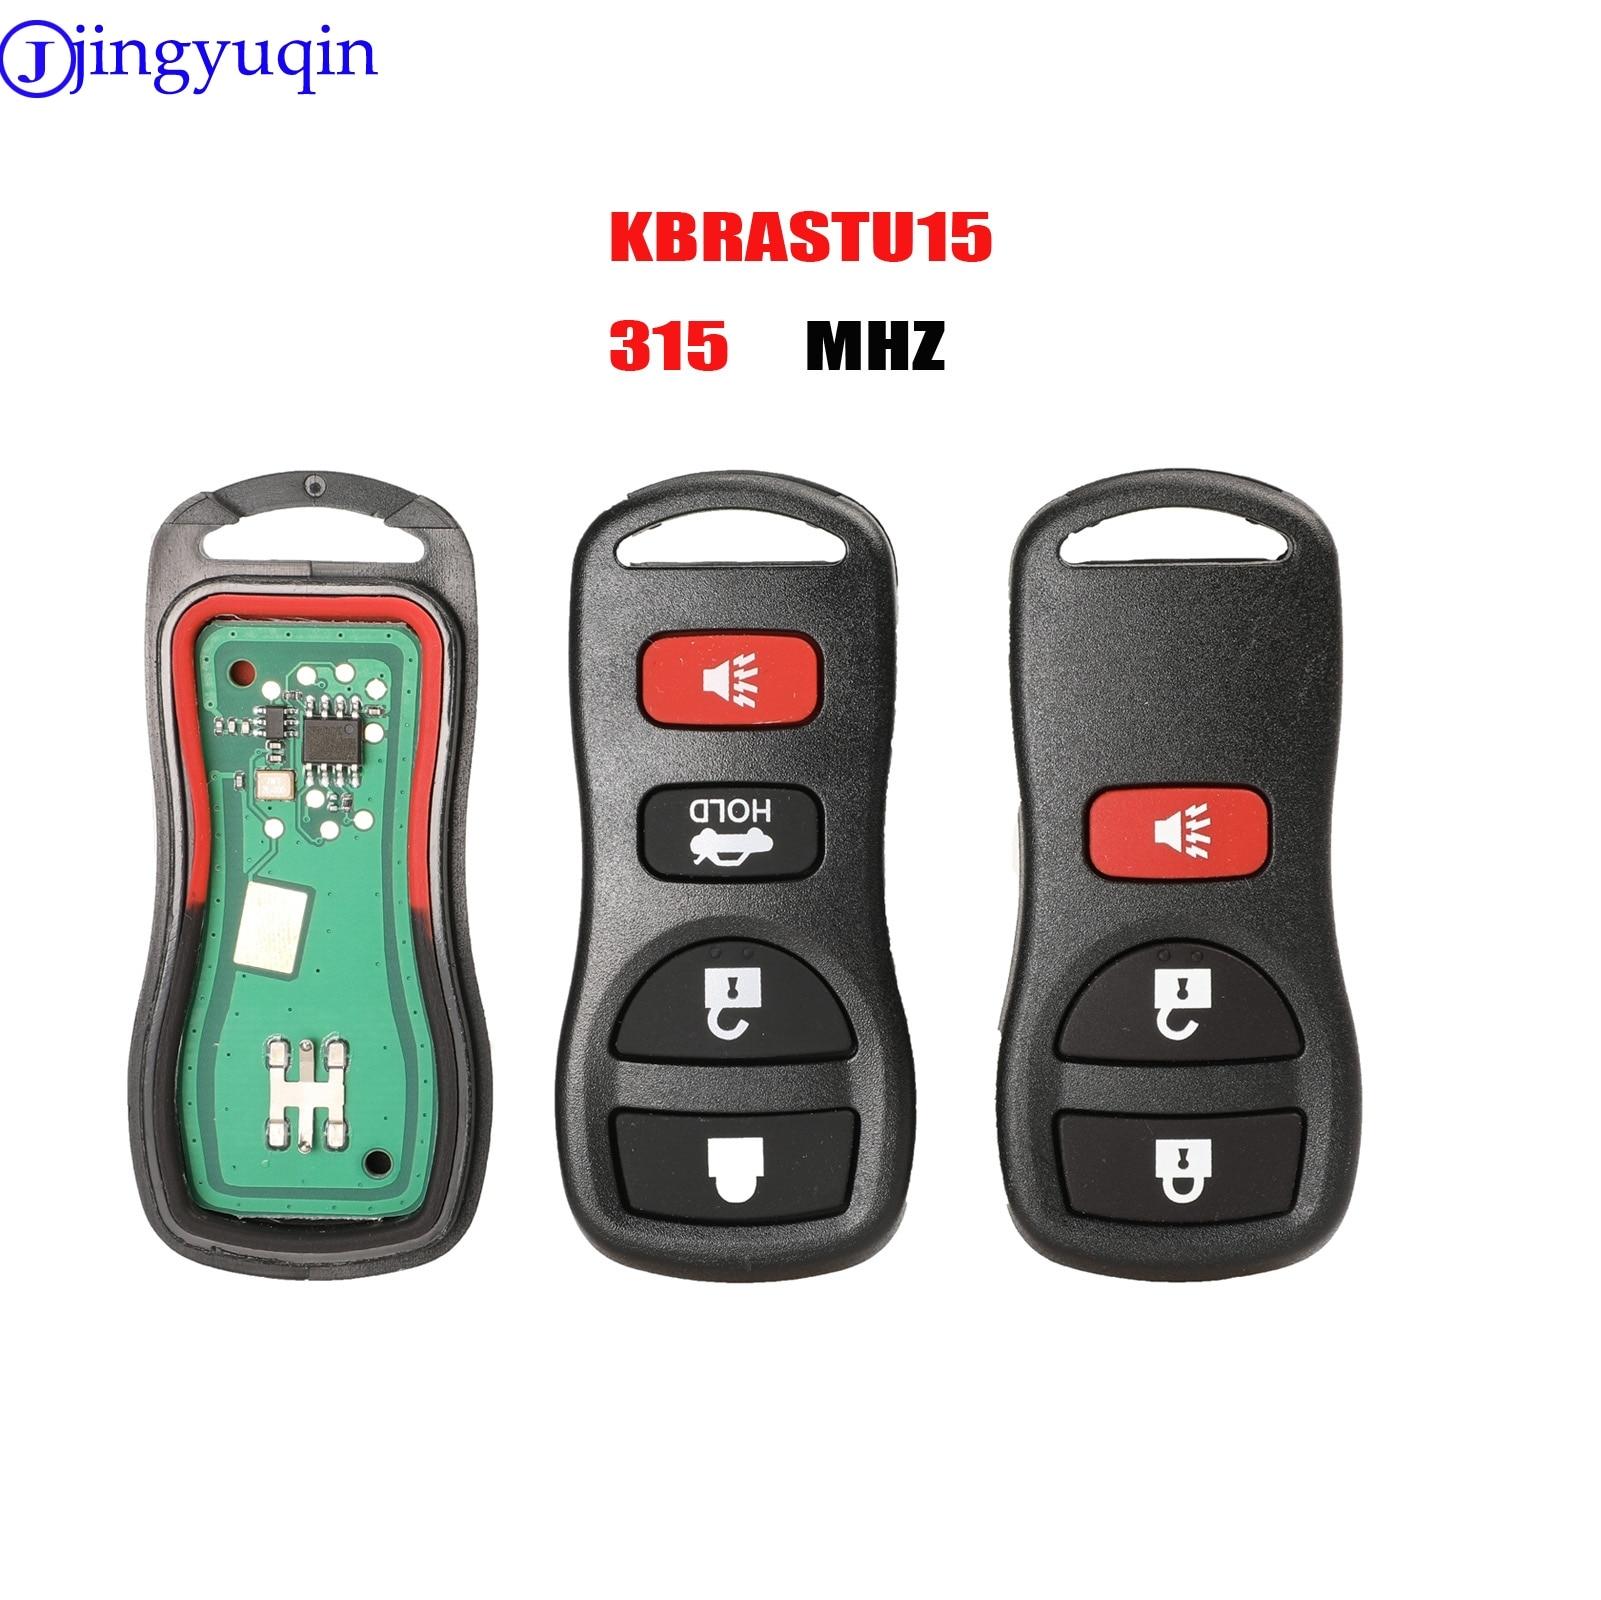 Jingyuqin 315MHZ 3/4 кнопки дистанционного ввода автомобиля ключ для Infiniti/Nissan Frontier Murano Armada Pathfinder 2002-2008 KBRASTU15